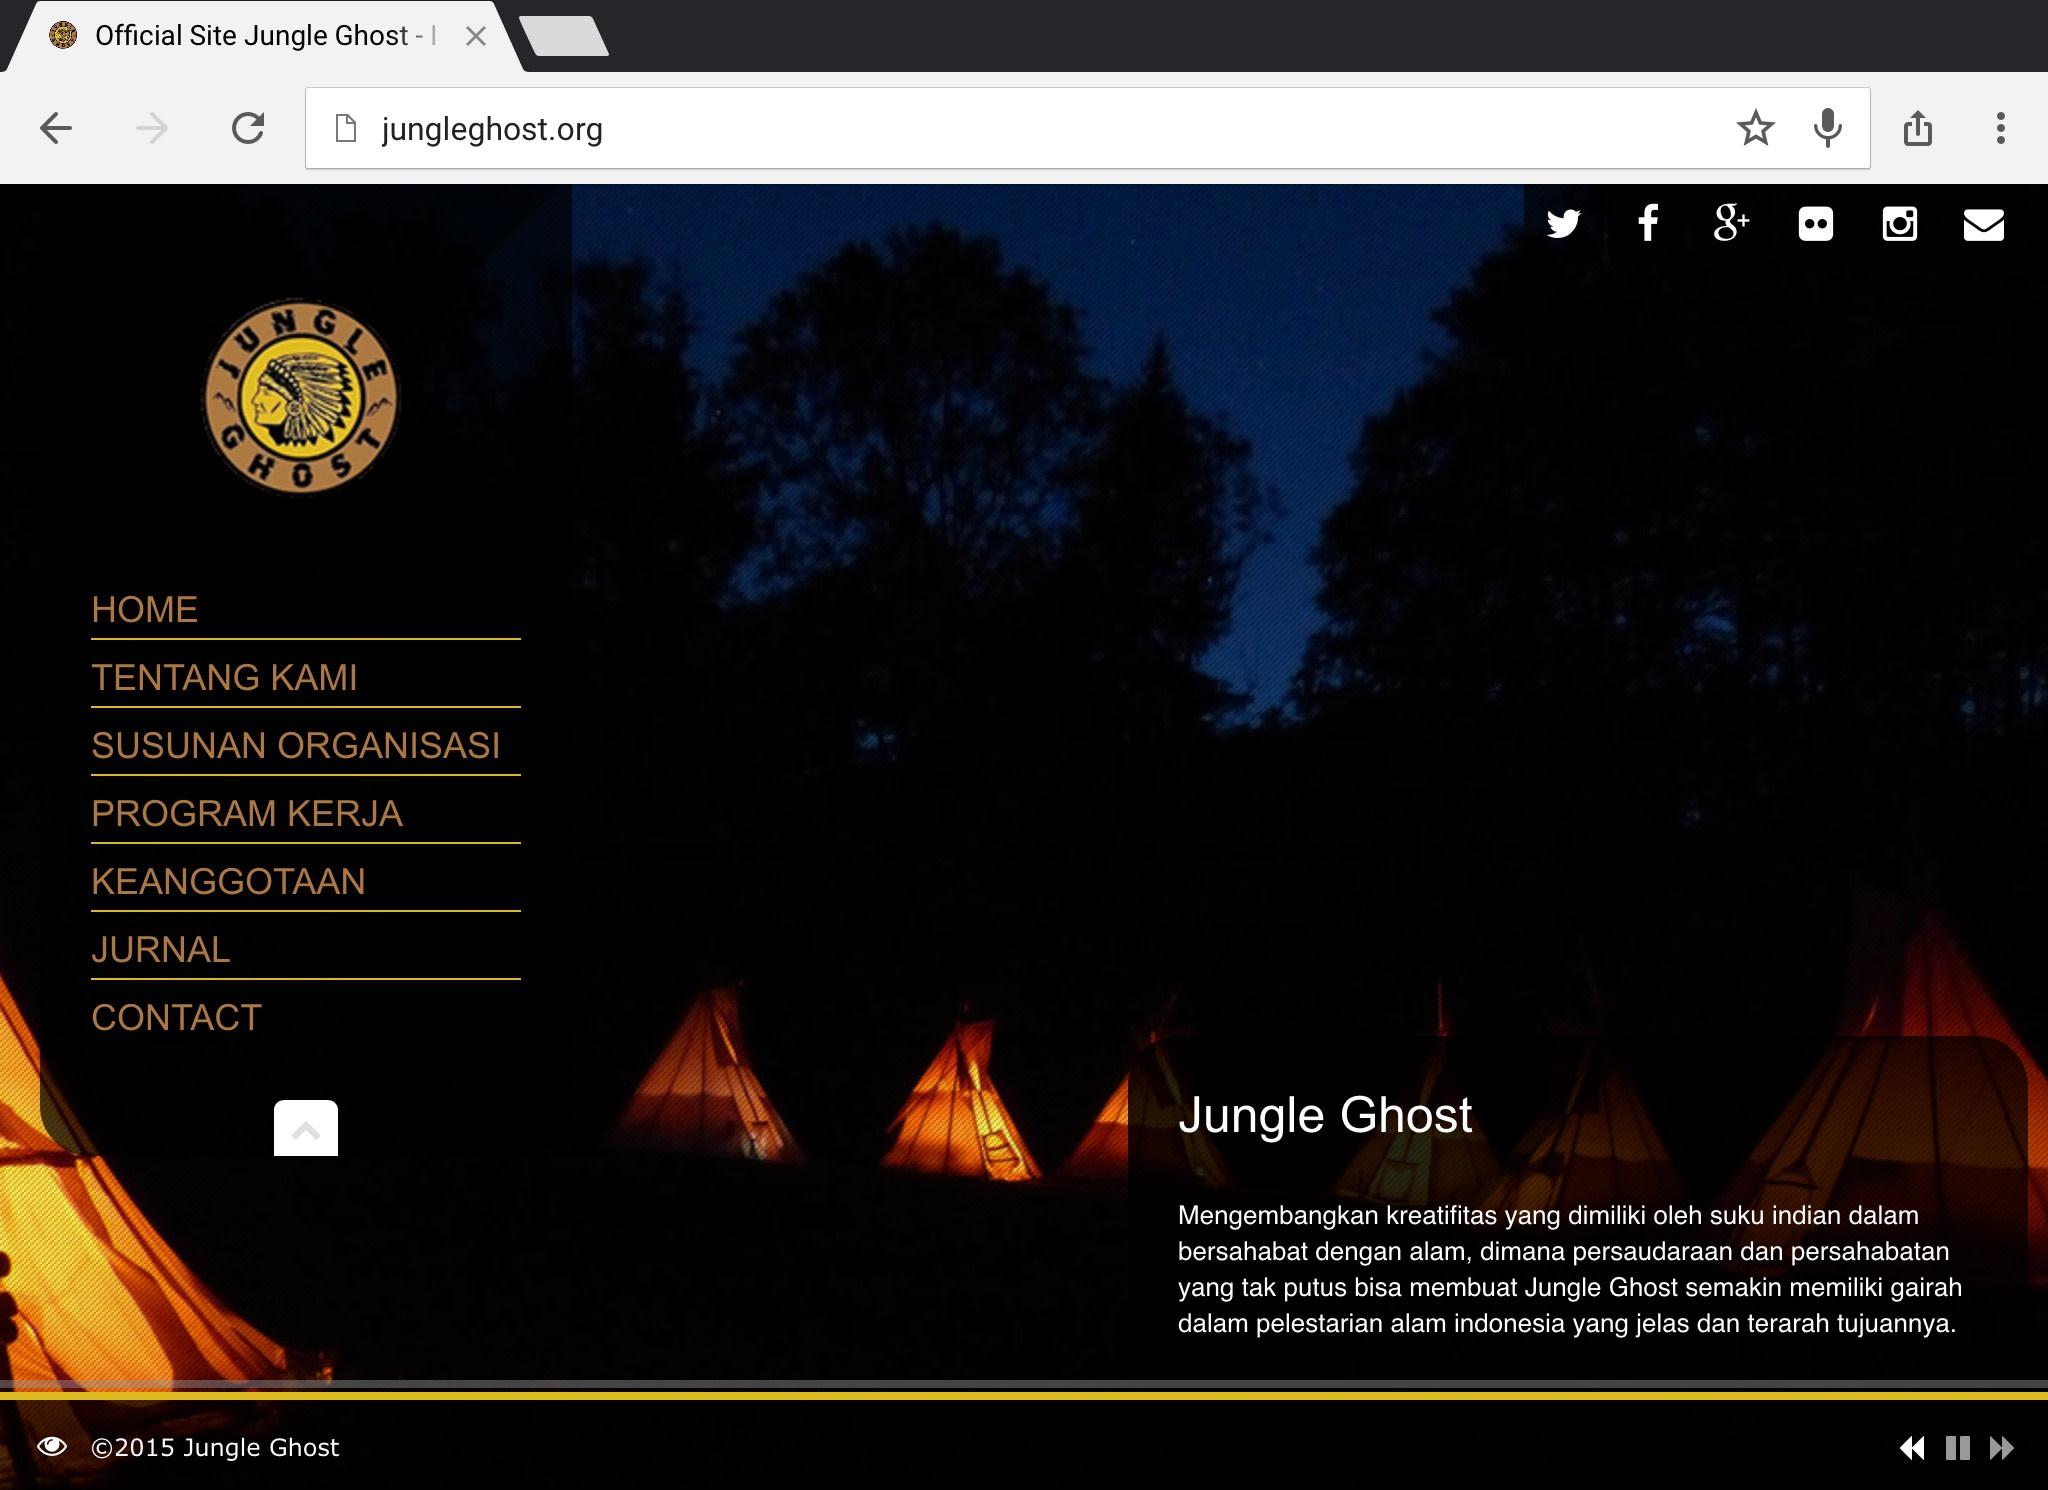 Jungle Ghost Luncurkan Website